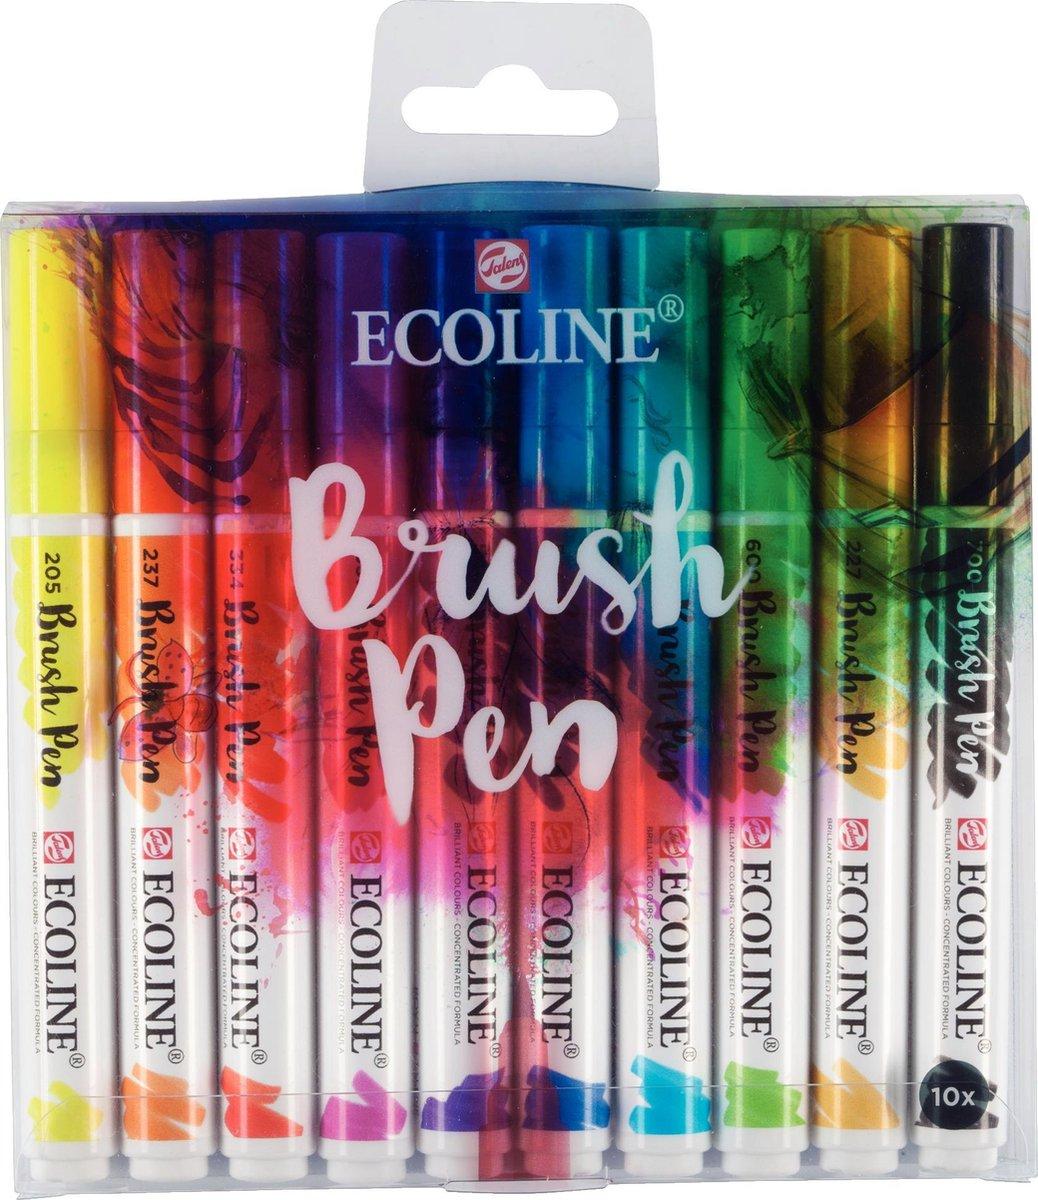 Talens Ecoline 10 Brush Pens